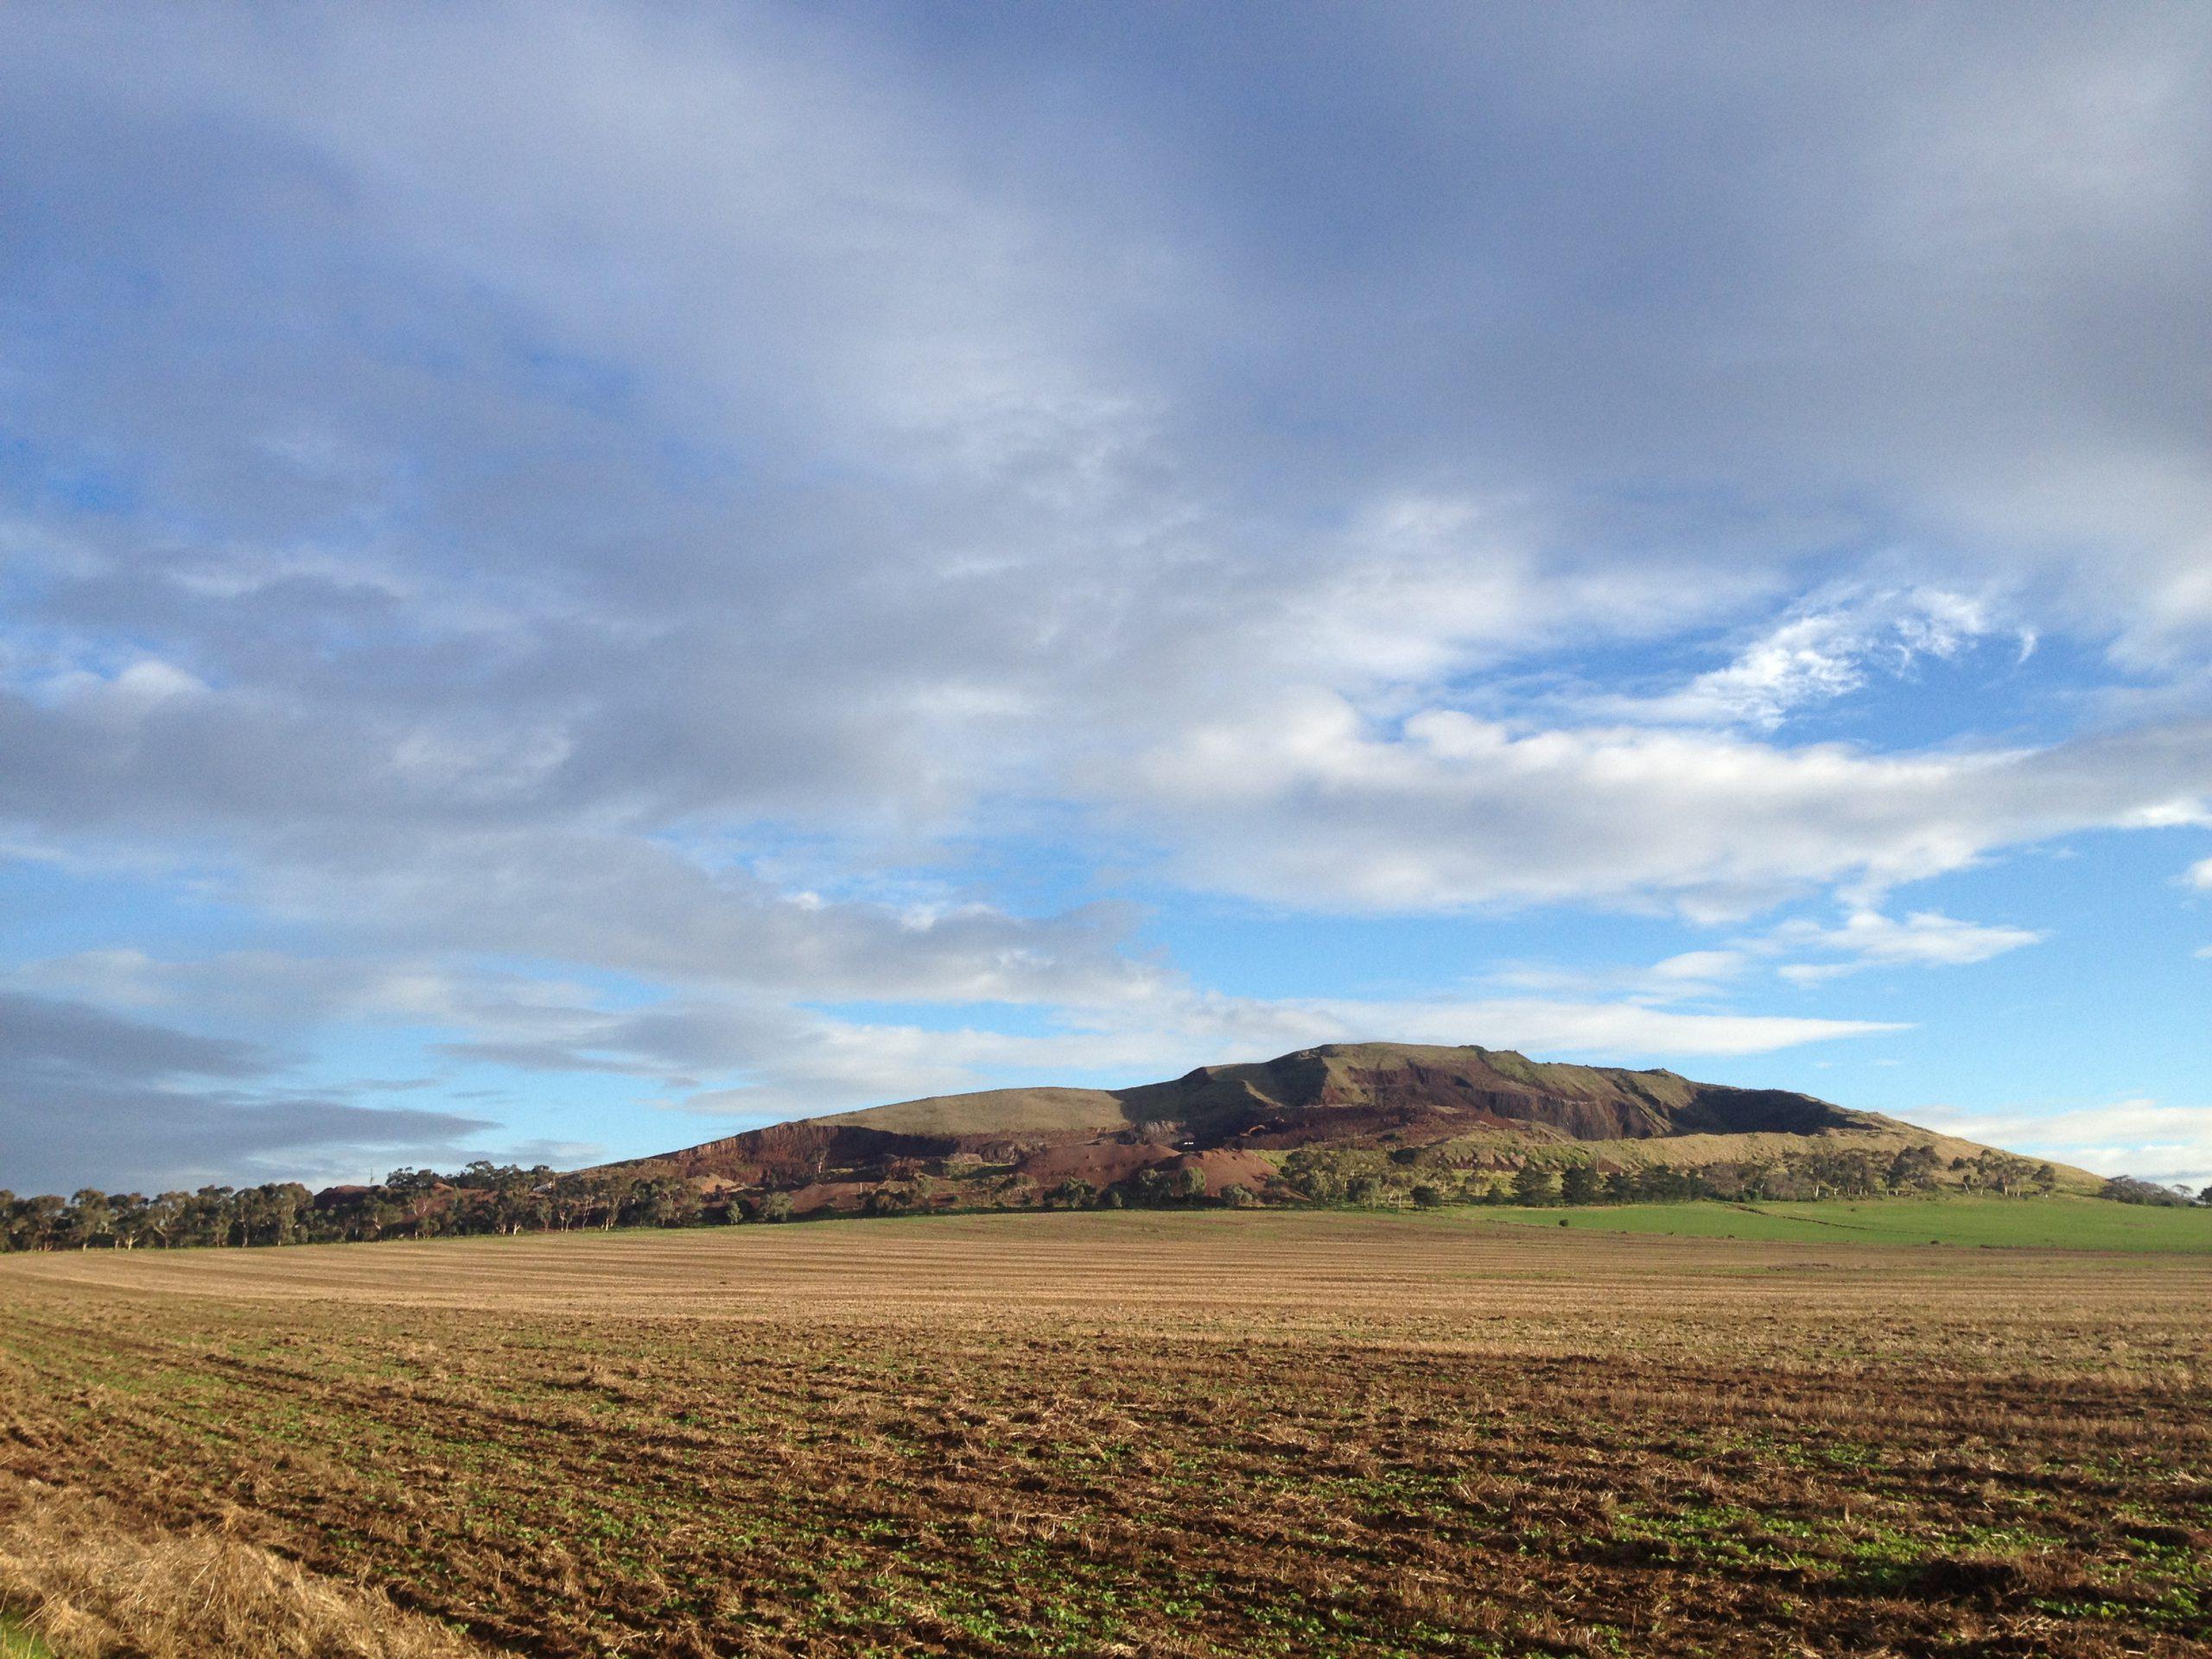 Aerolite's Quarry viewed to the north